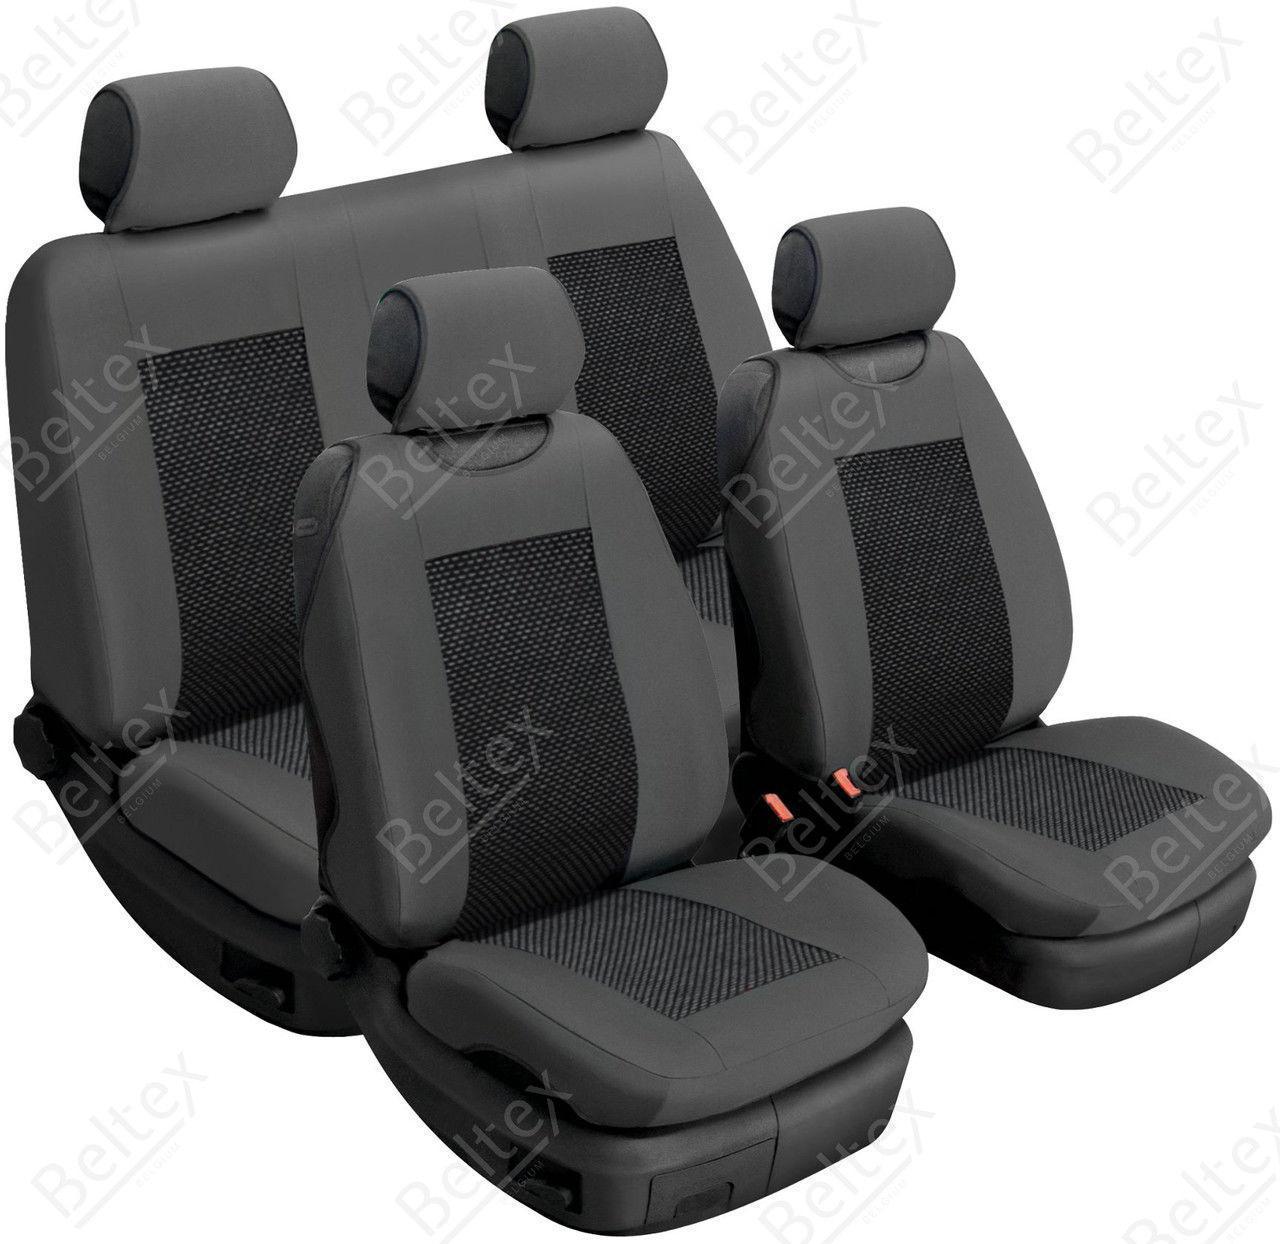 Майки/чехлы на сиденья Шевроле Авео Т250 (Chevrolet Aveo T250)